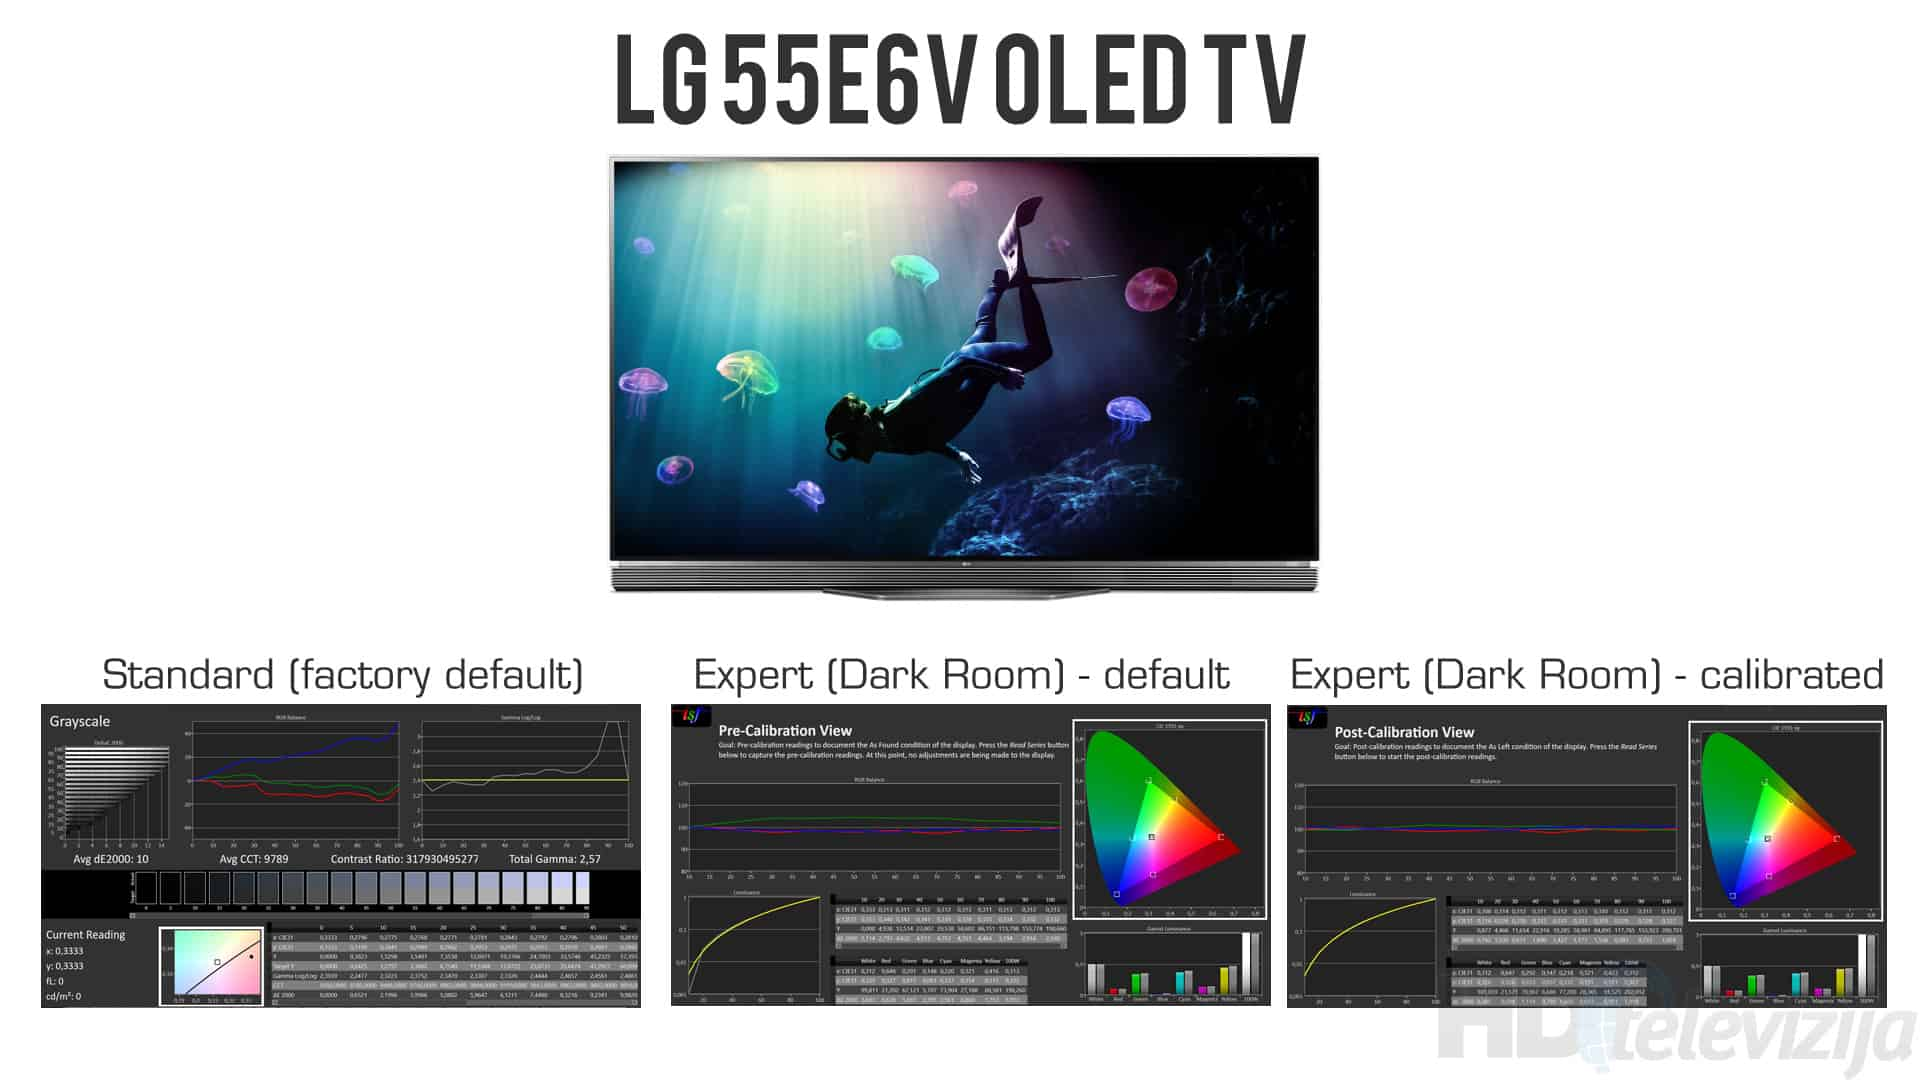 kvaliteta slike kalibracija zaslon i procesor lg 55e6v e6 uhd hdr oled tv recenzija. Black Bedroom Furniture Sets. Home Design Ideas